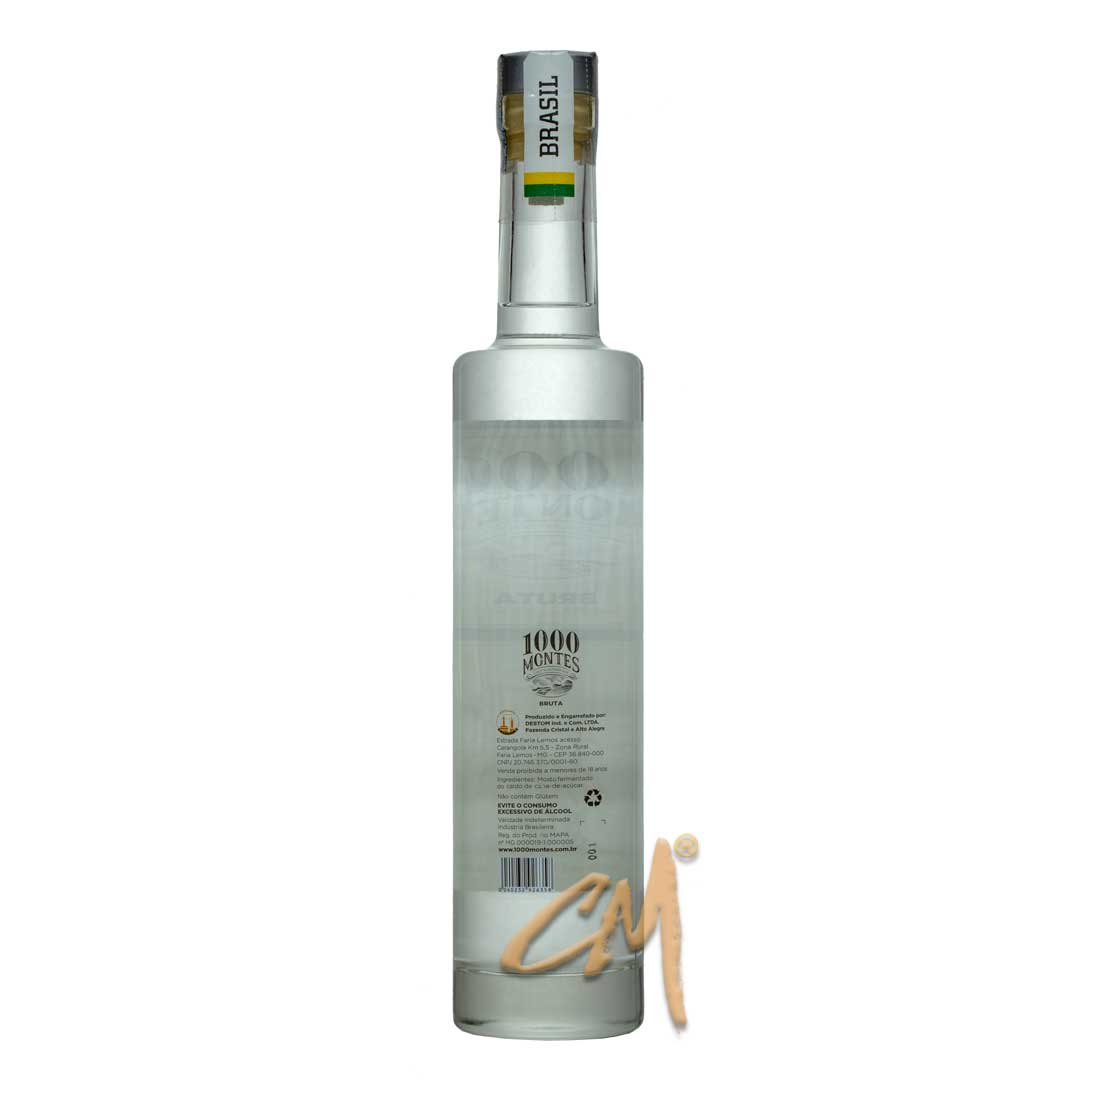 Cachaça 1000 Montes Bruta 500 ml (Faria Lemos - MG)